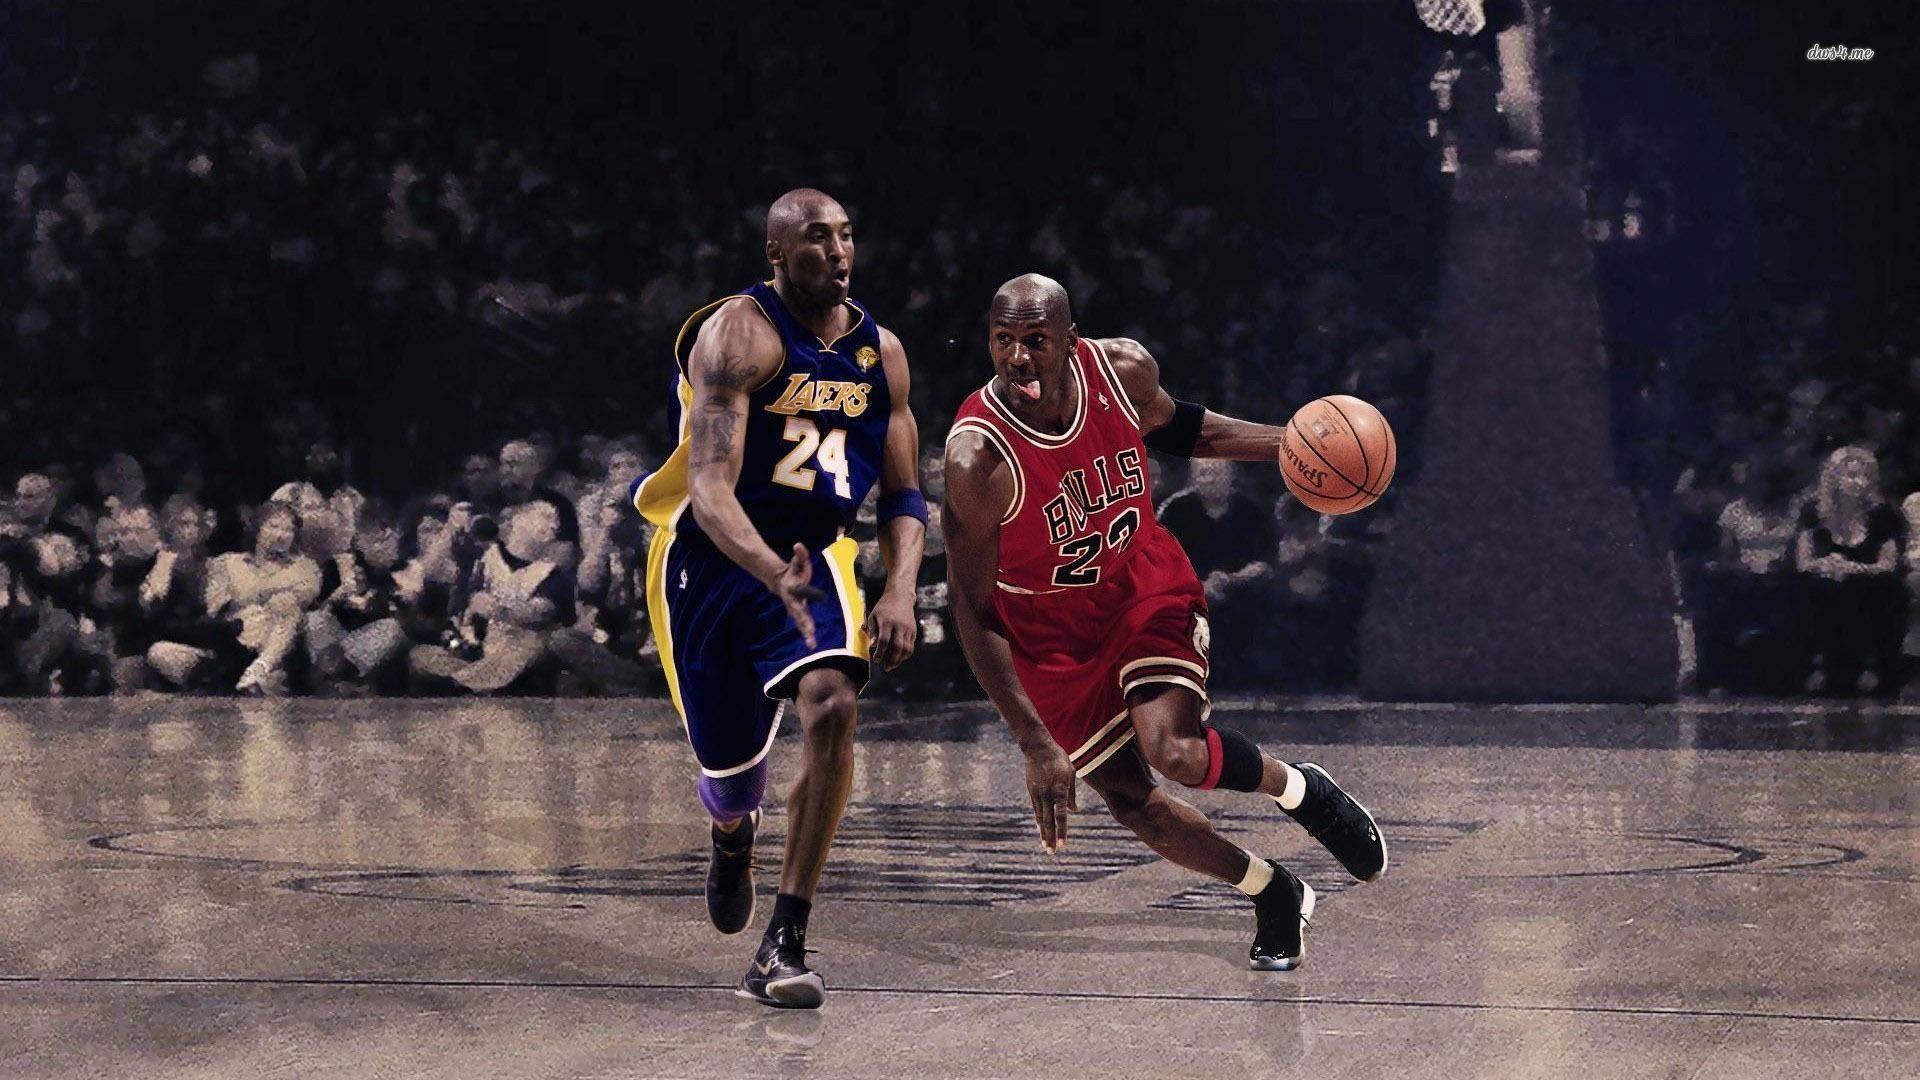 Michael Jordan Wallpaper High Definition Kobe Vs Jordan Shaq And Kobe Kobe Bryant Wallpaper